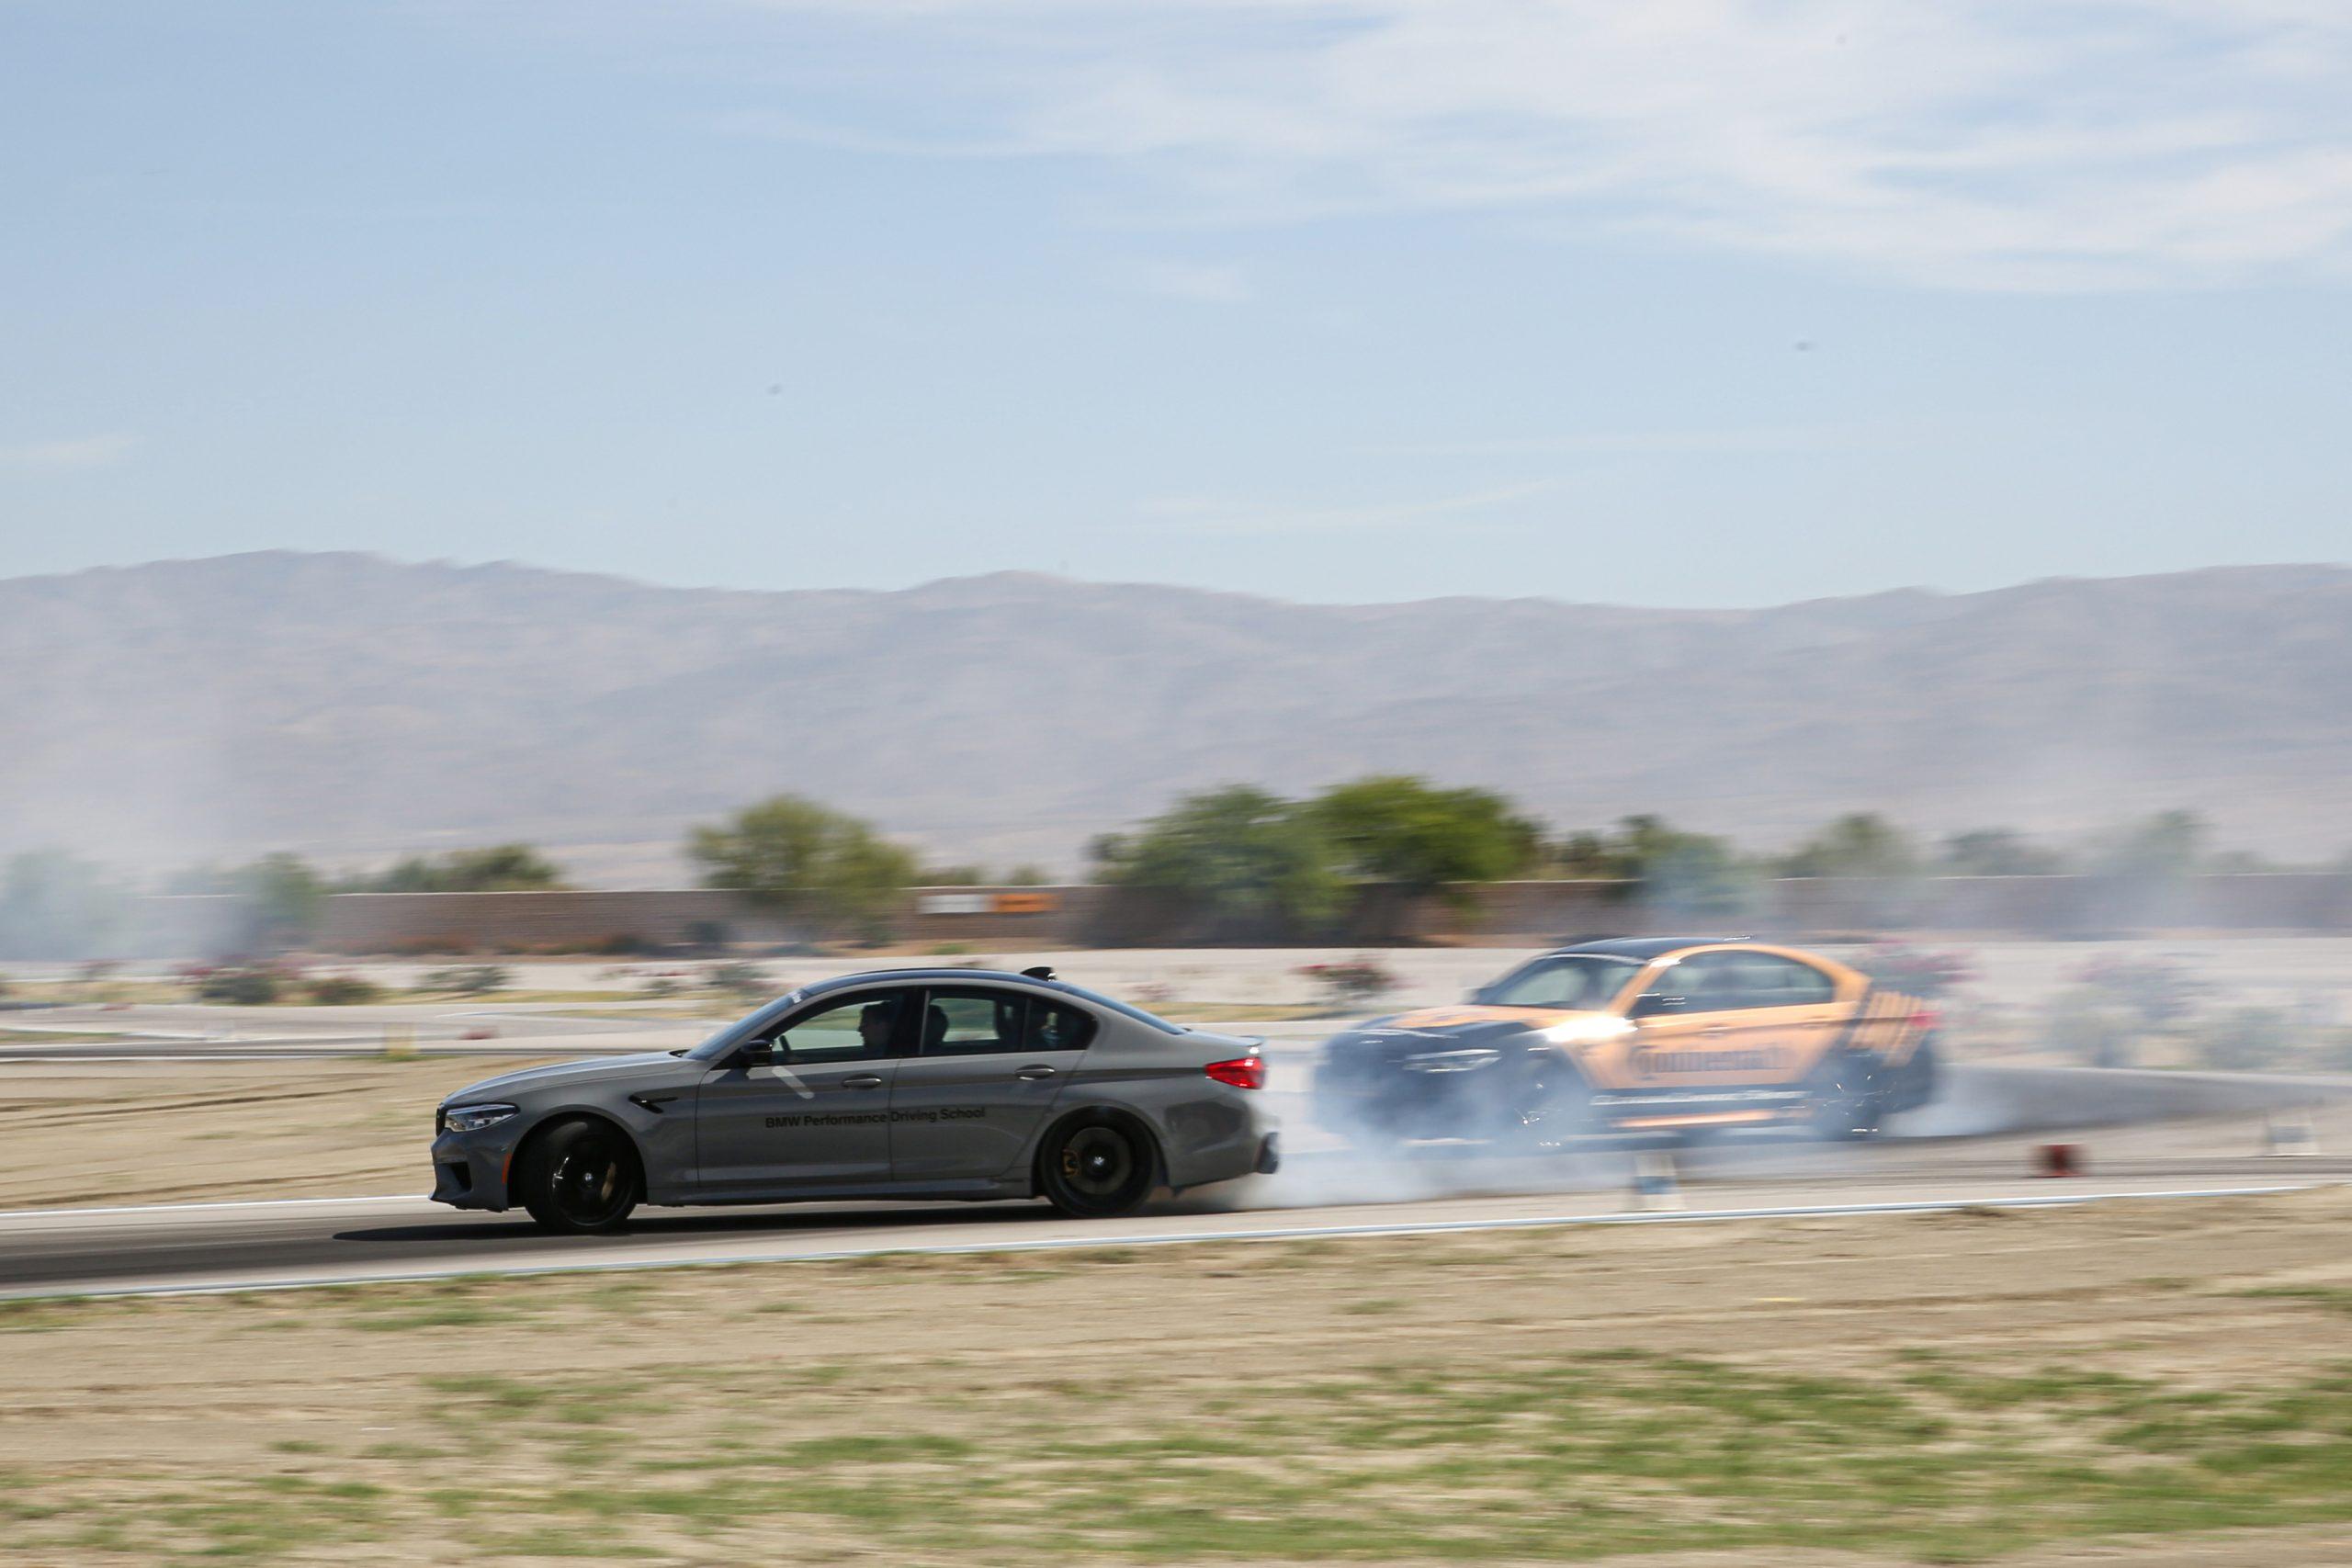 BMW Performance Driving School M5 drifting